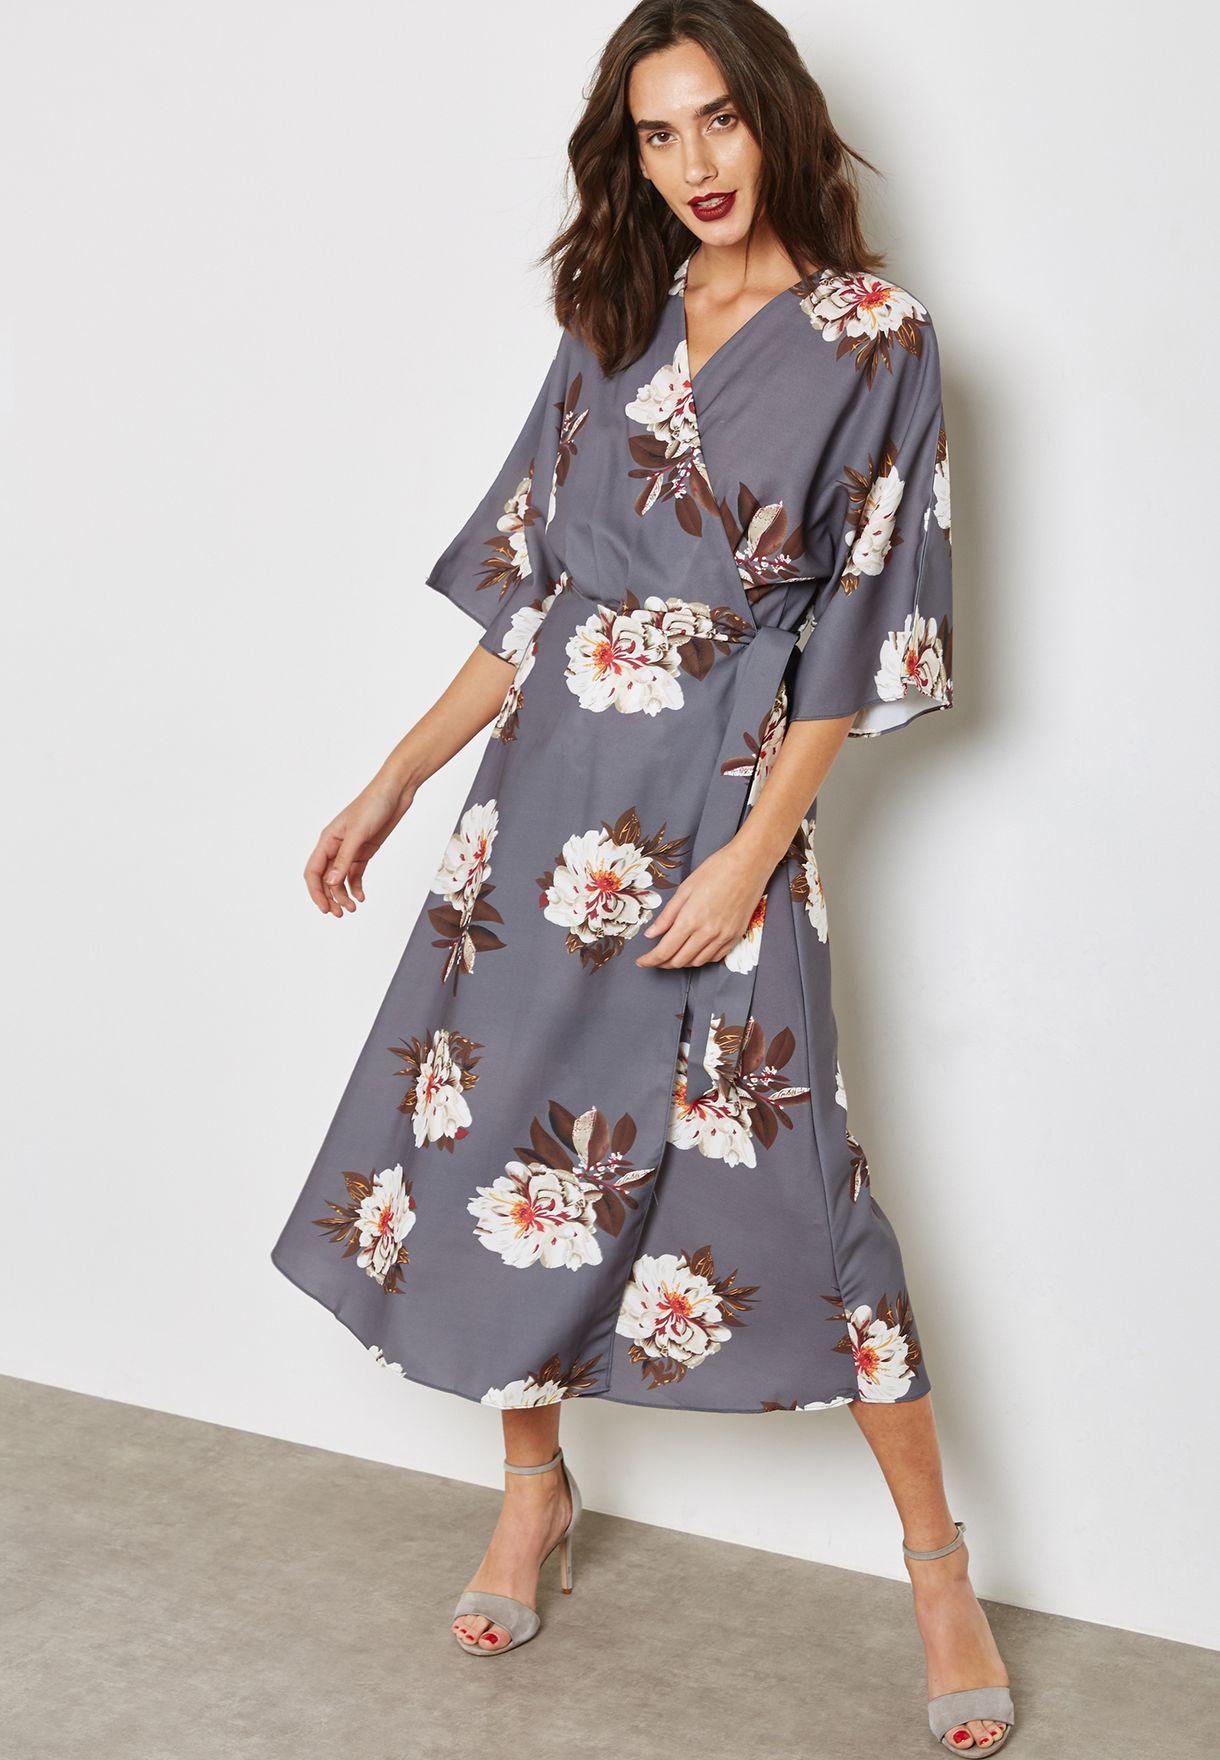 8bf059bc1 Shop Ella prints Floral Print Wrap Front Self Tie Dress 6384 for ...